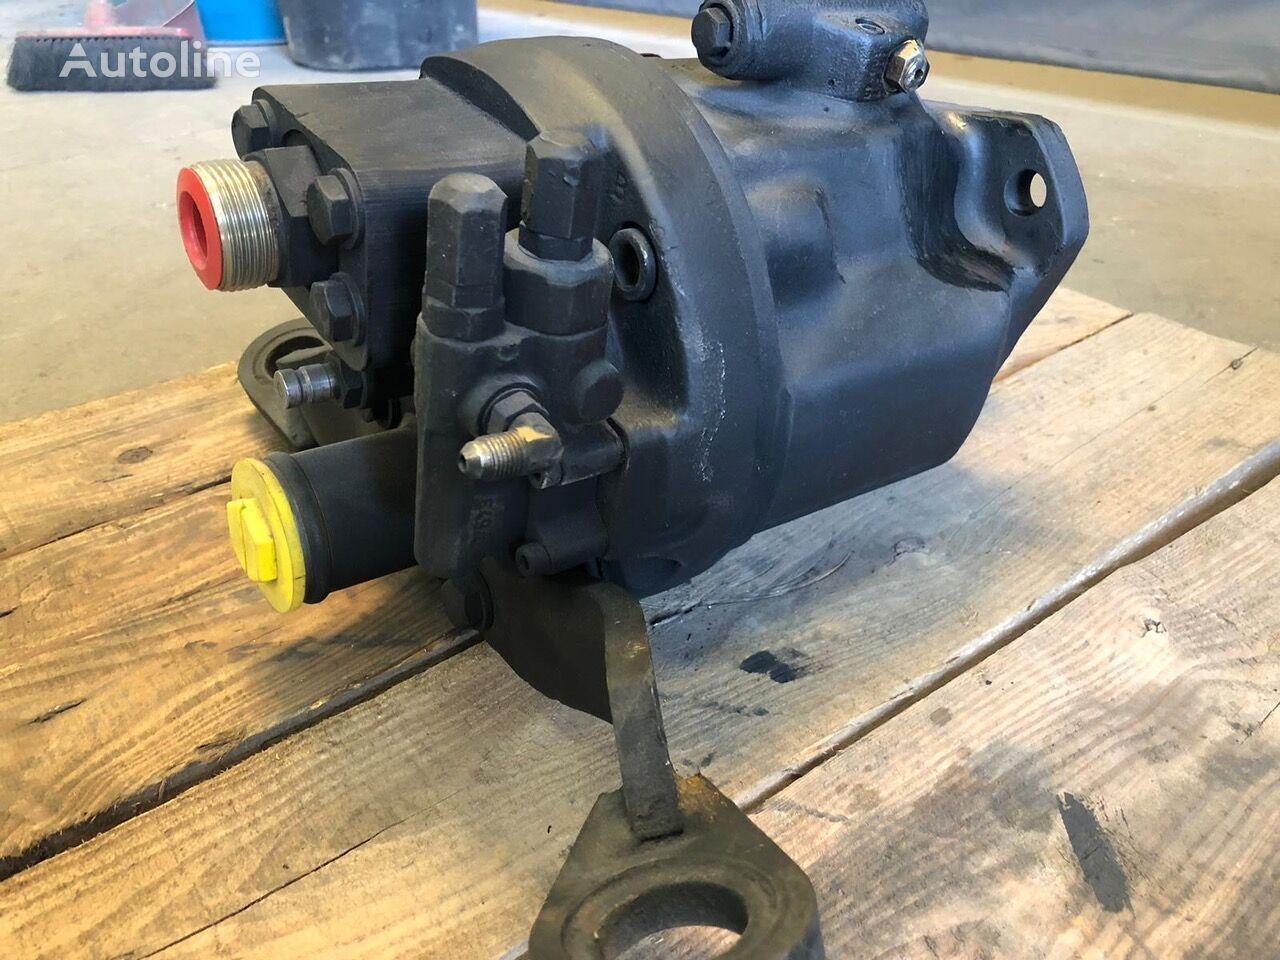 CATERPILLAR 428 /438 - hydraulic pump 428 / 438 hidraulična pumpa za kamiona